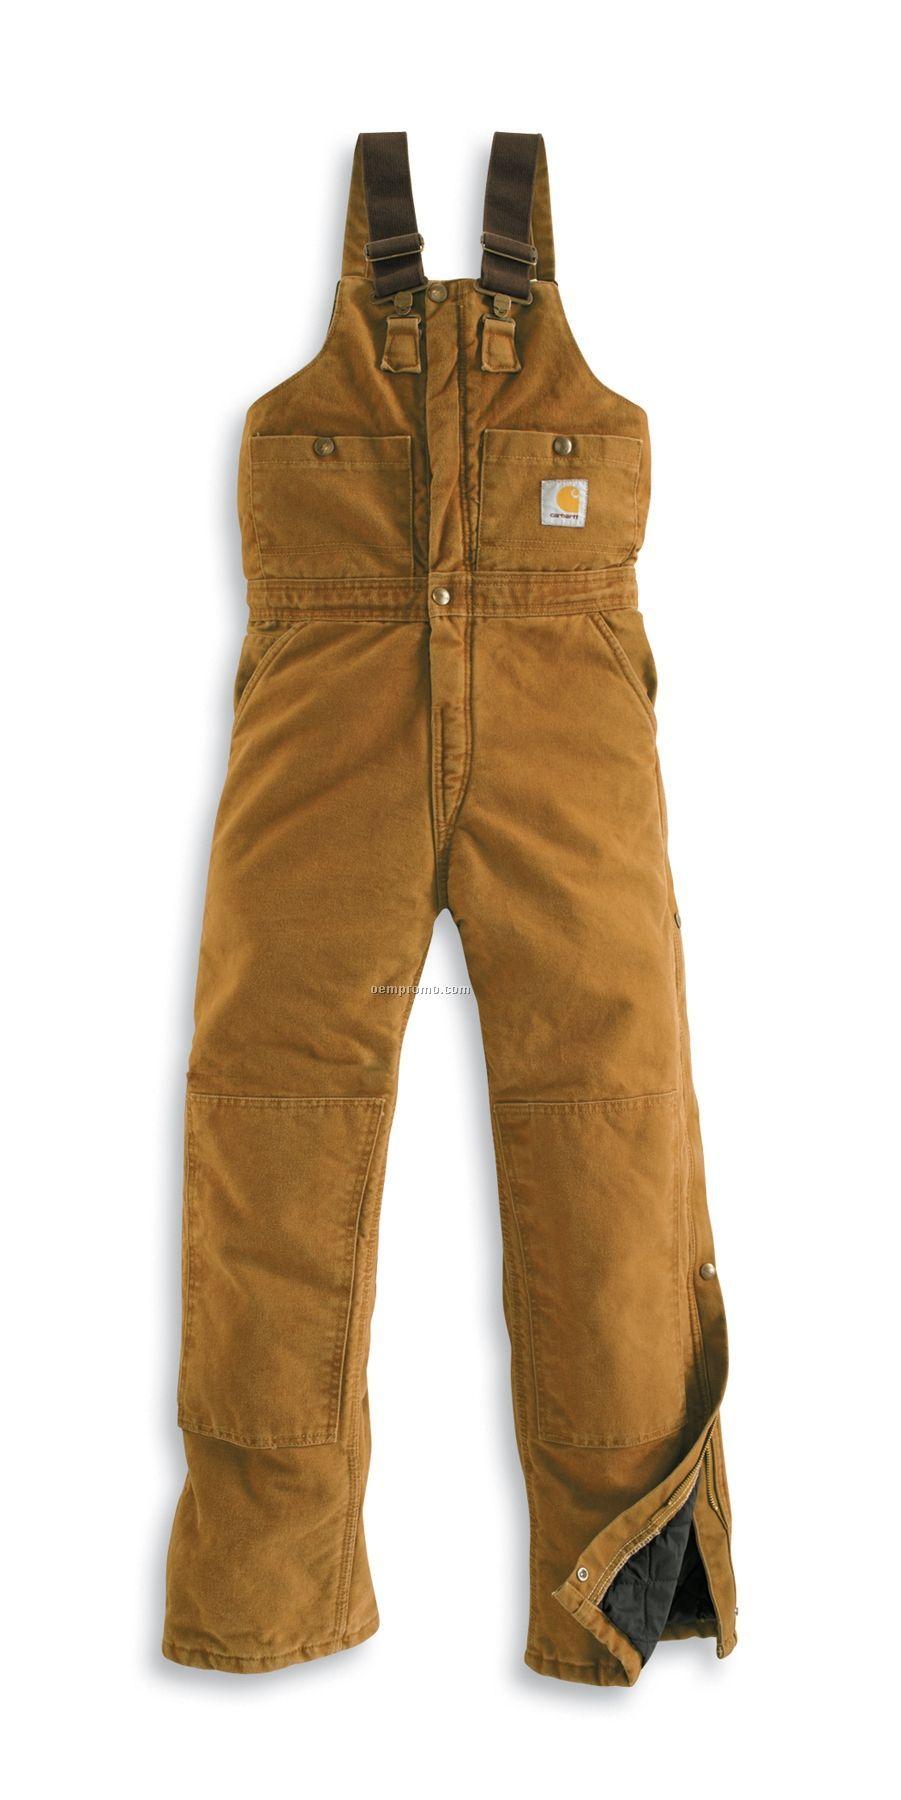 Carhartt Women's Sandstone Quilt Lined Bib Overalls (Sizes 2-18)